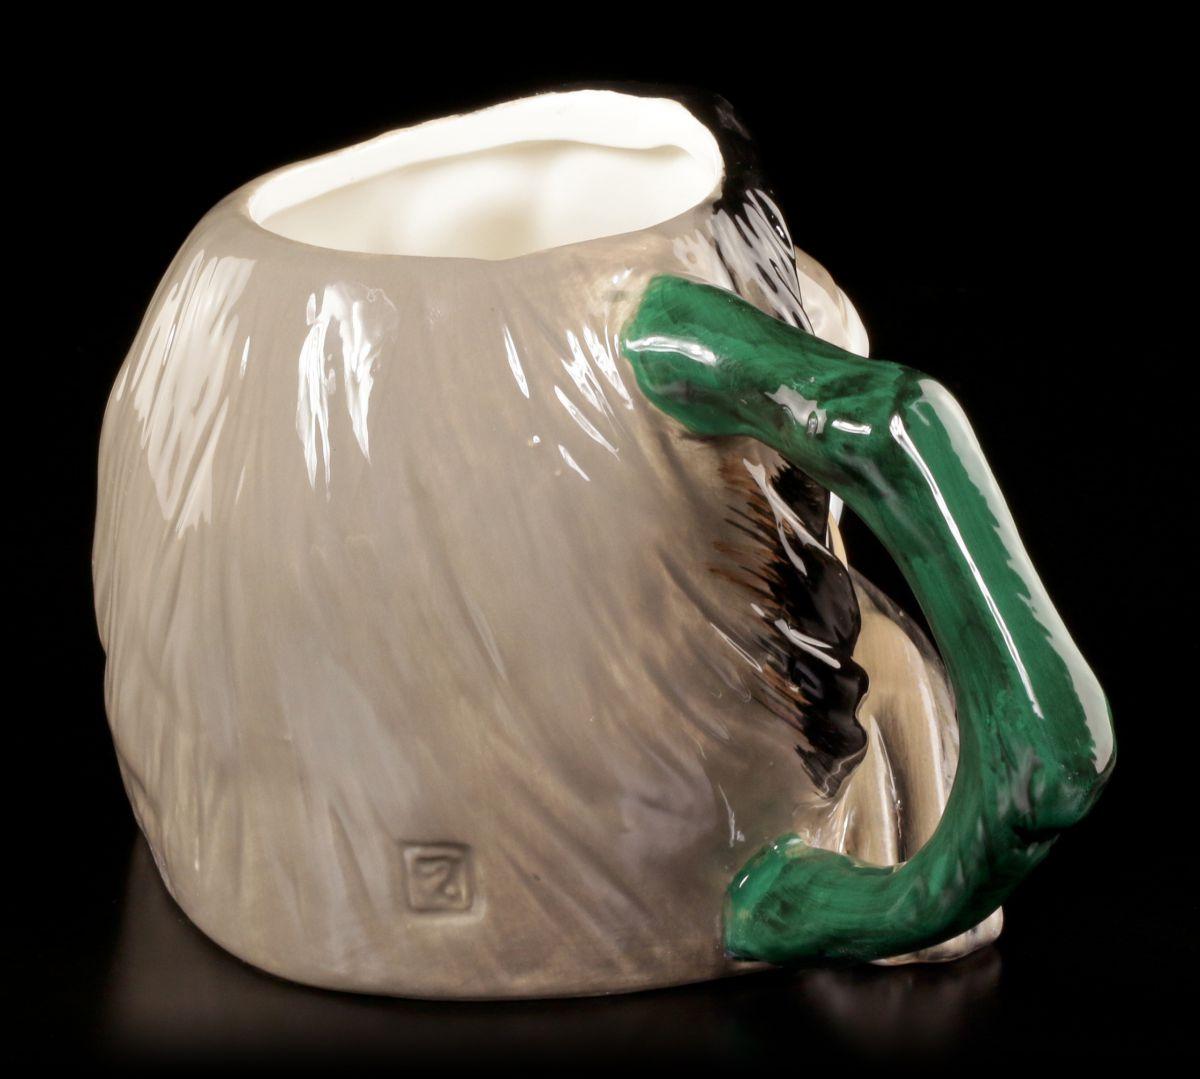 faultier keramik tasse b ro spa geschenk lustig fun kaffee becher ebay. Black Bedroom Furniture Sets. Home Design Ideas